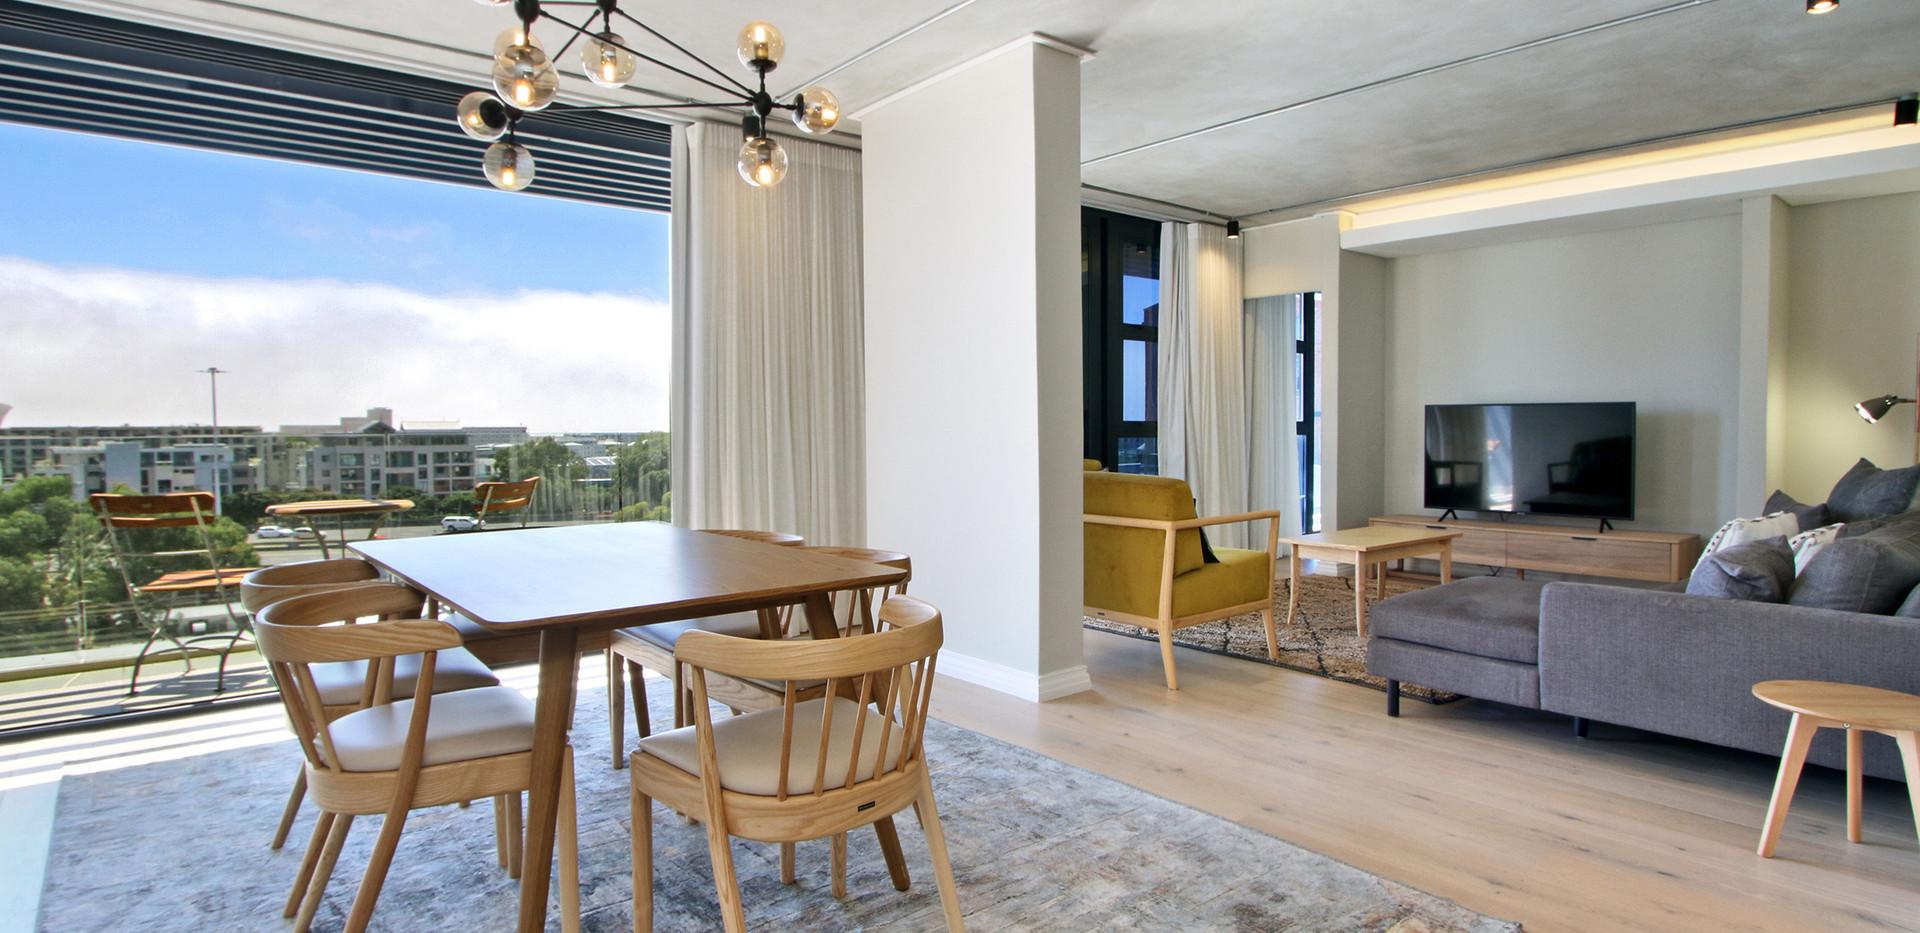 Diningroom_Penthouse_Docklands_609_ITC_2